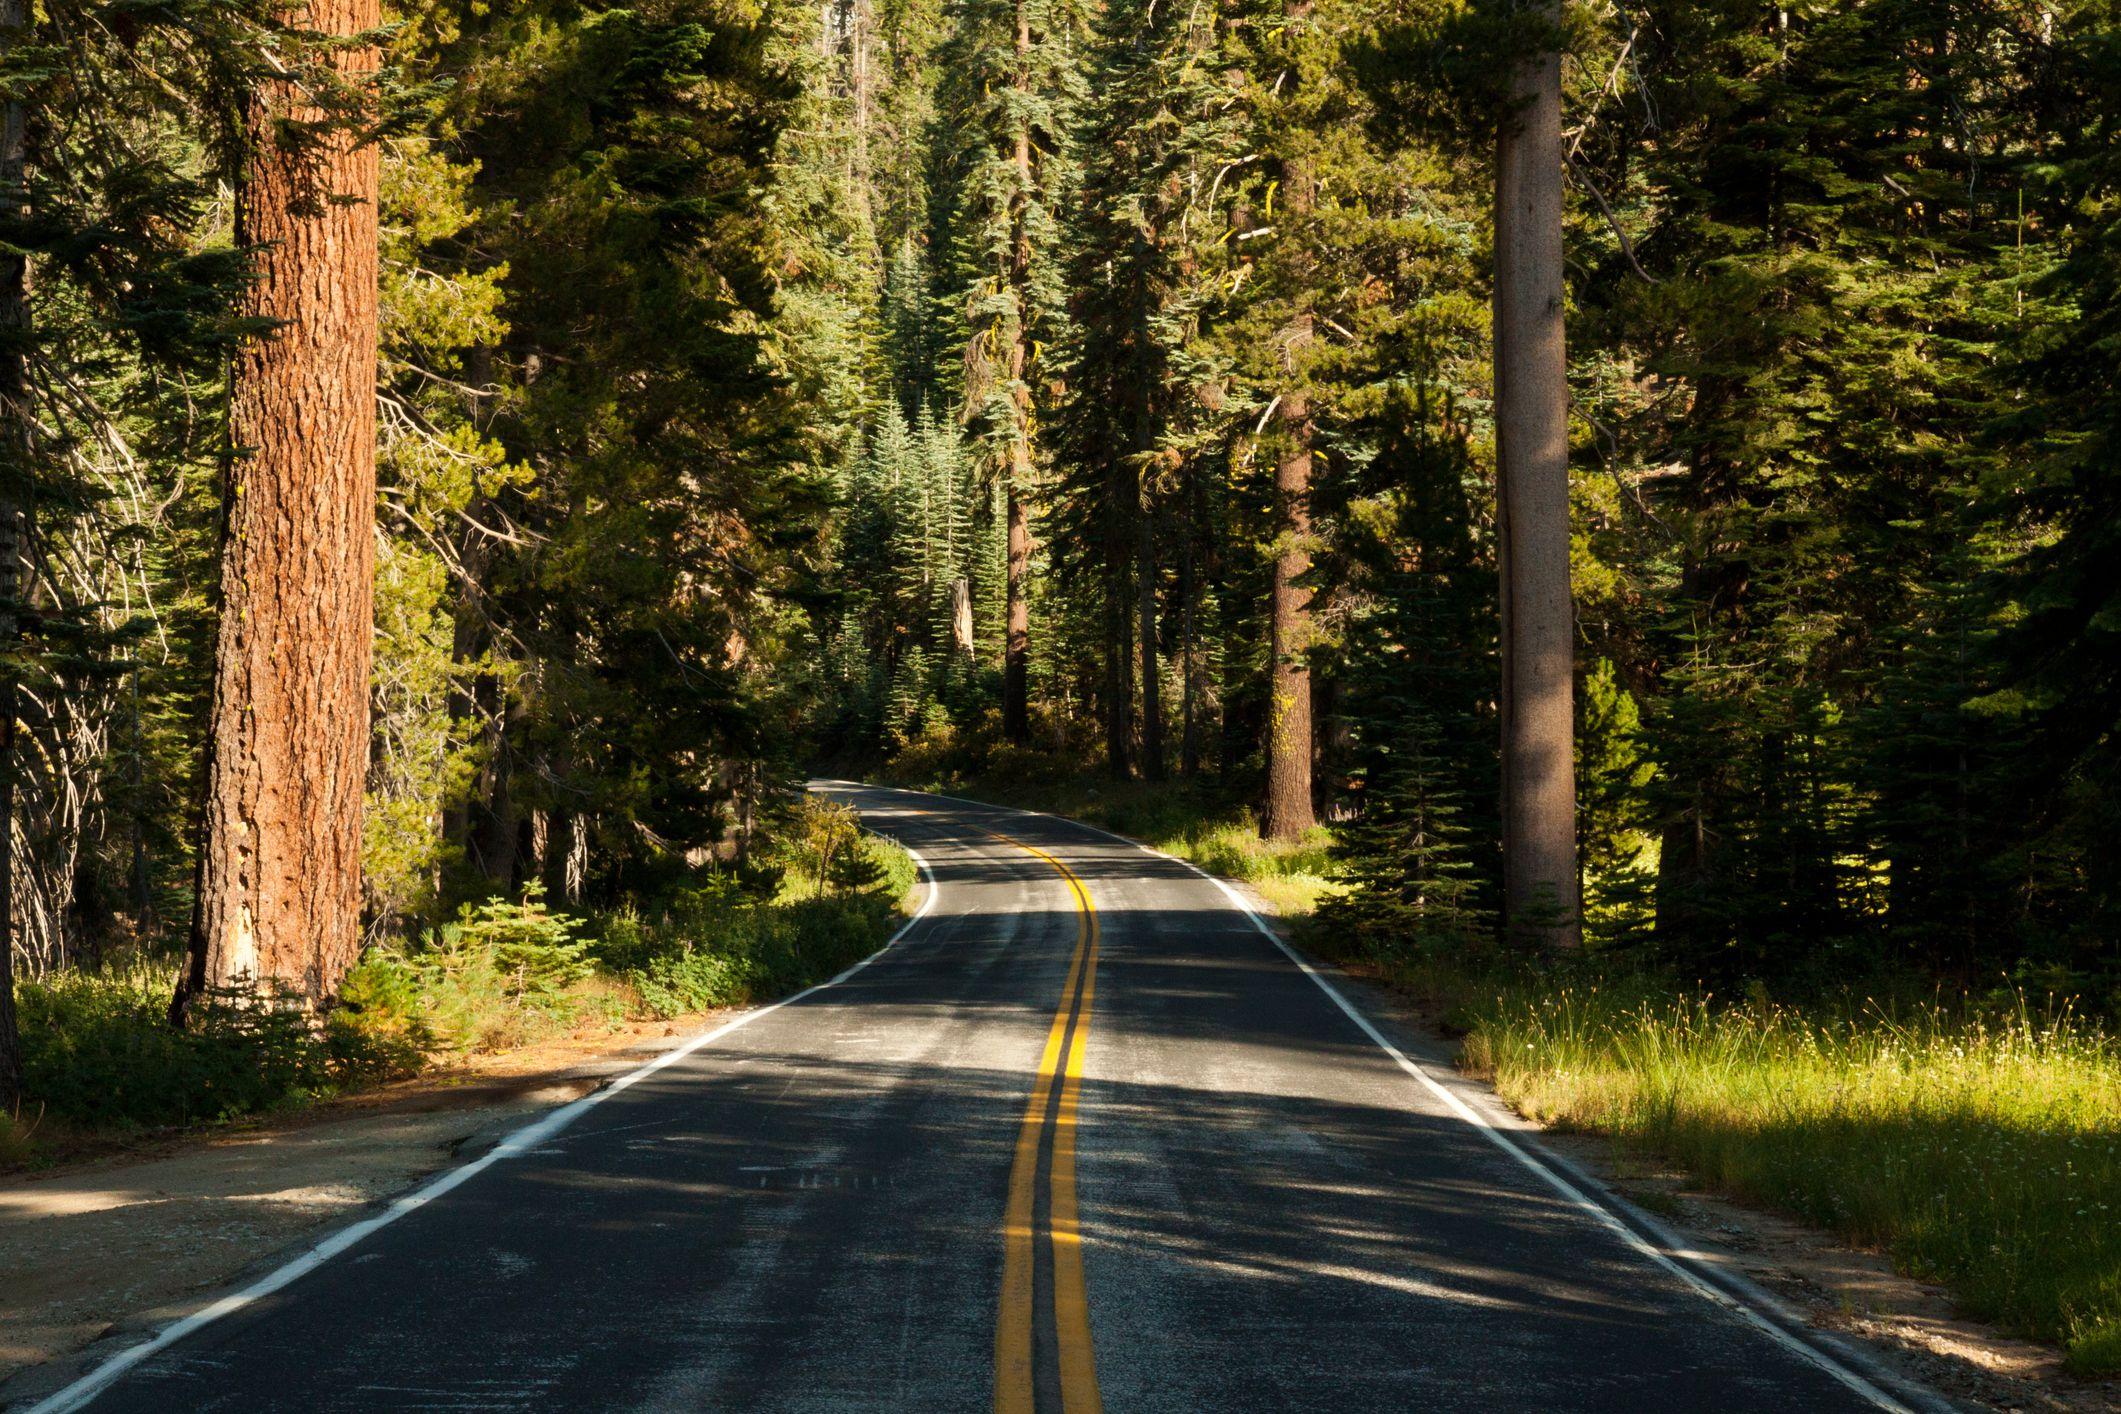 Road in Yosemite